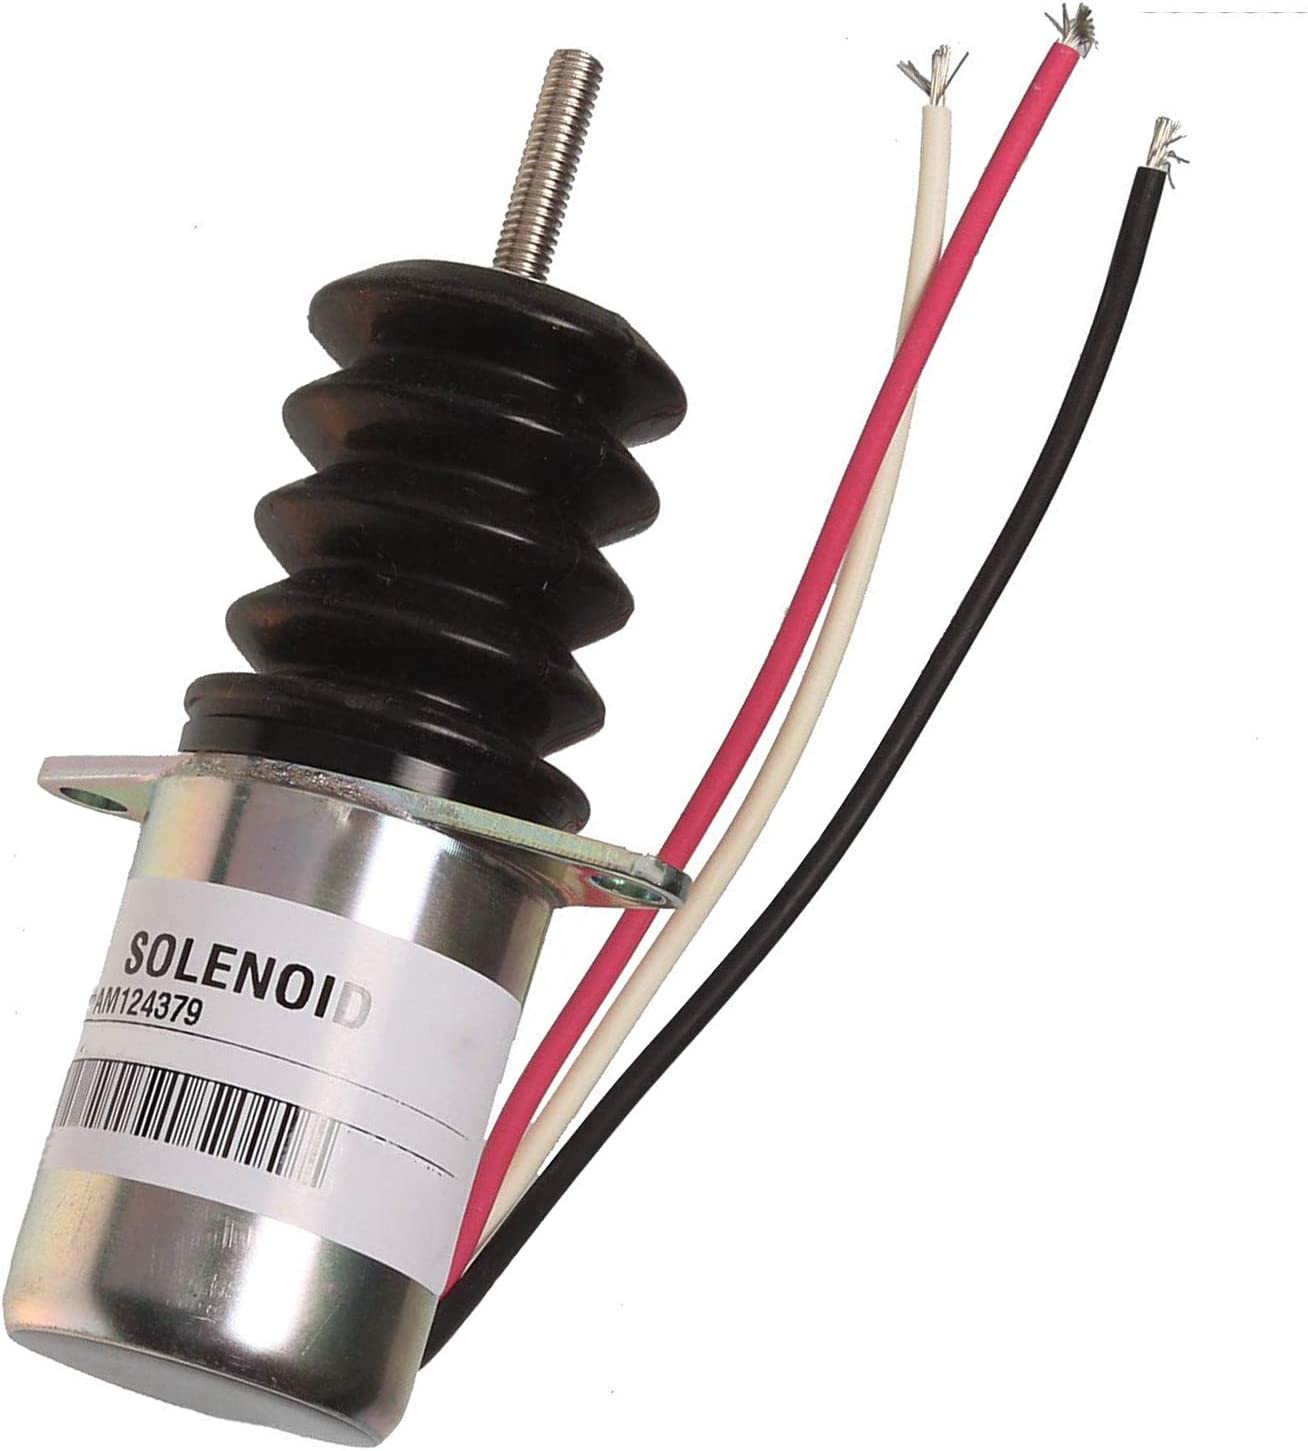 New AM124379 Fuel Shut Off Solenoid for JOHN DEERE 415 455 F915 F925 F935